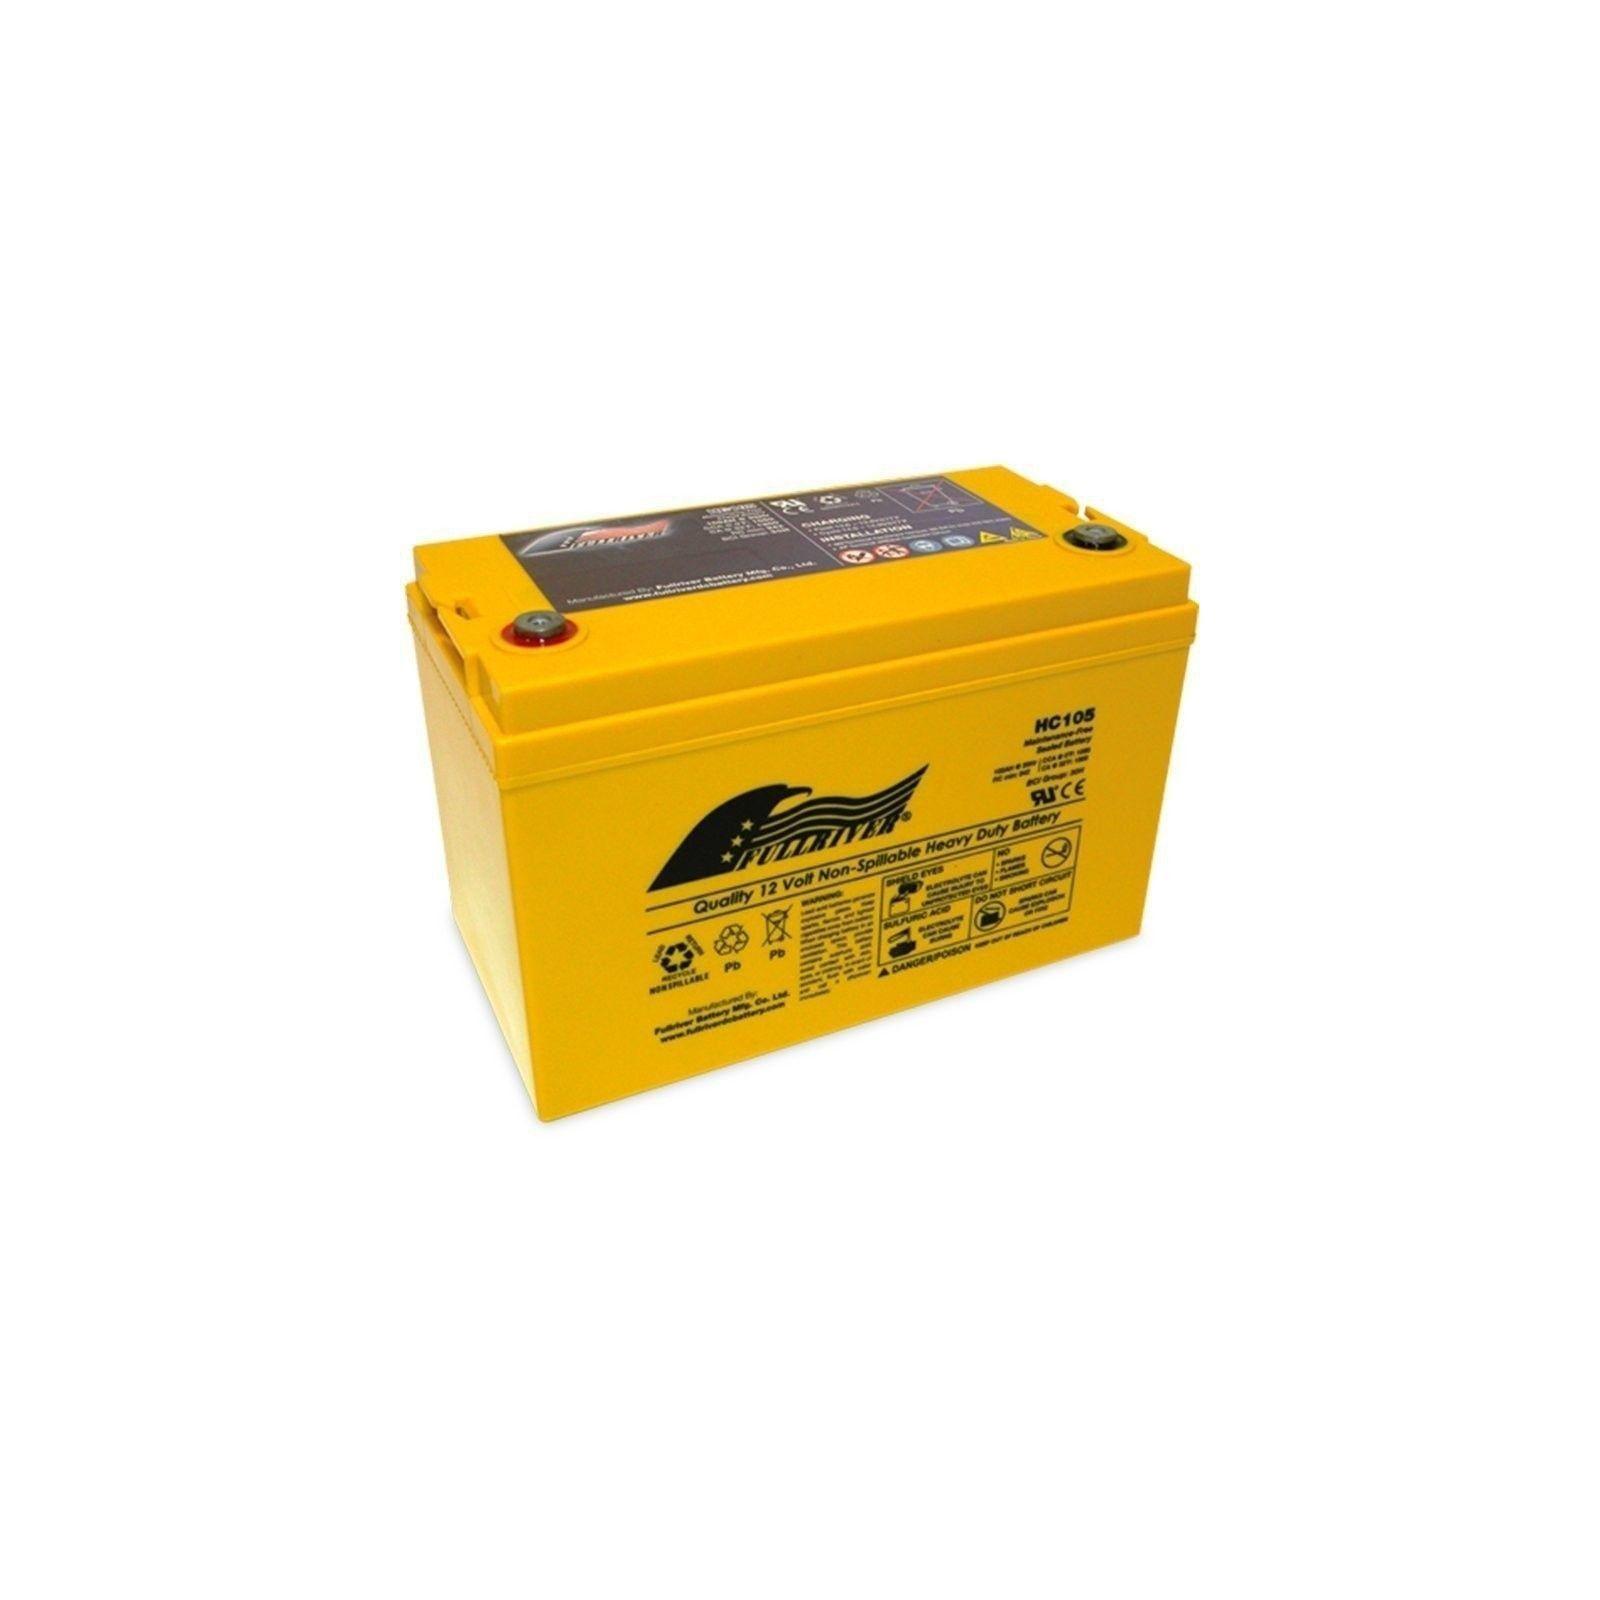 Battery Fullriver HC105 105Ah 1050A 12V Hc FULLRIVER - 1